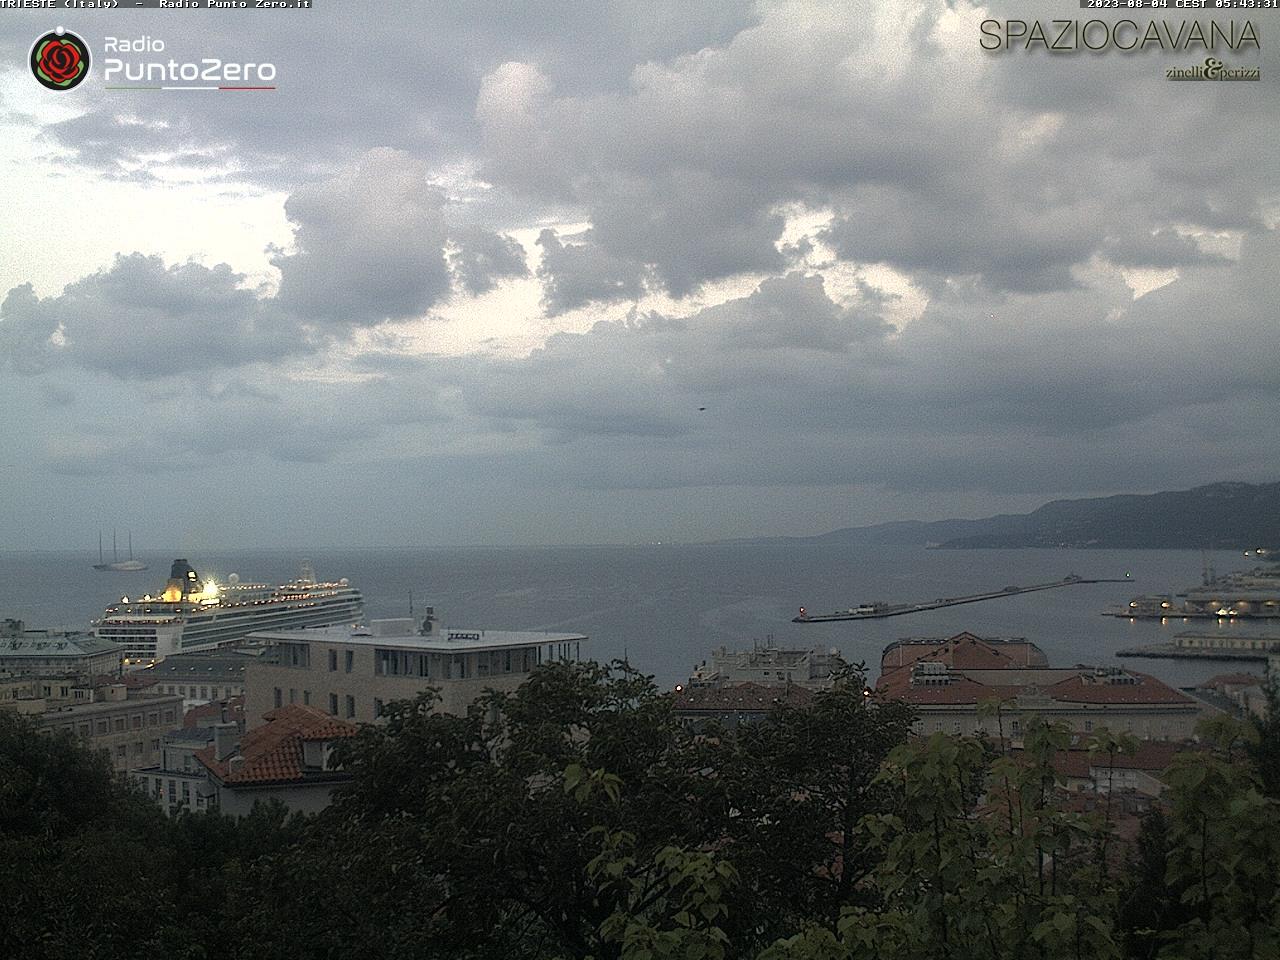 Trieste webcam - Radio Punto Zero Tre Venezie webcam, Friuli-Venezia Giulia, Trieste